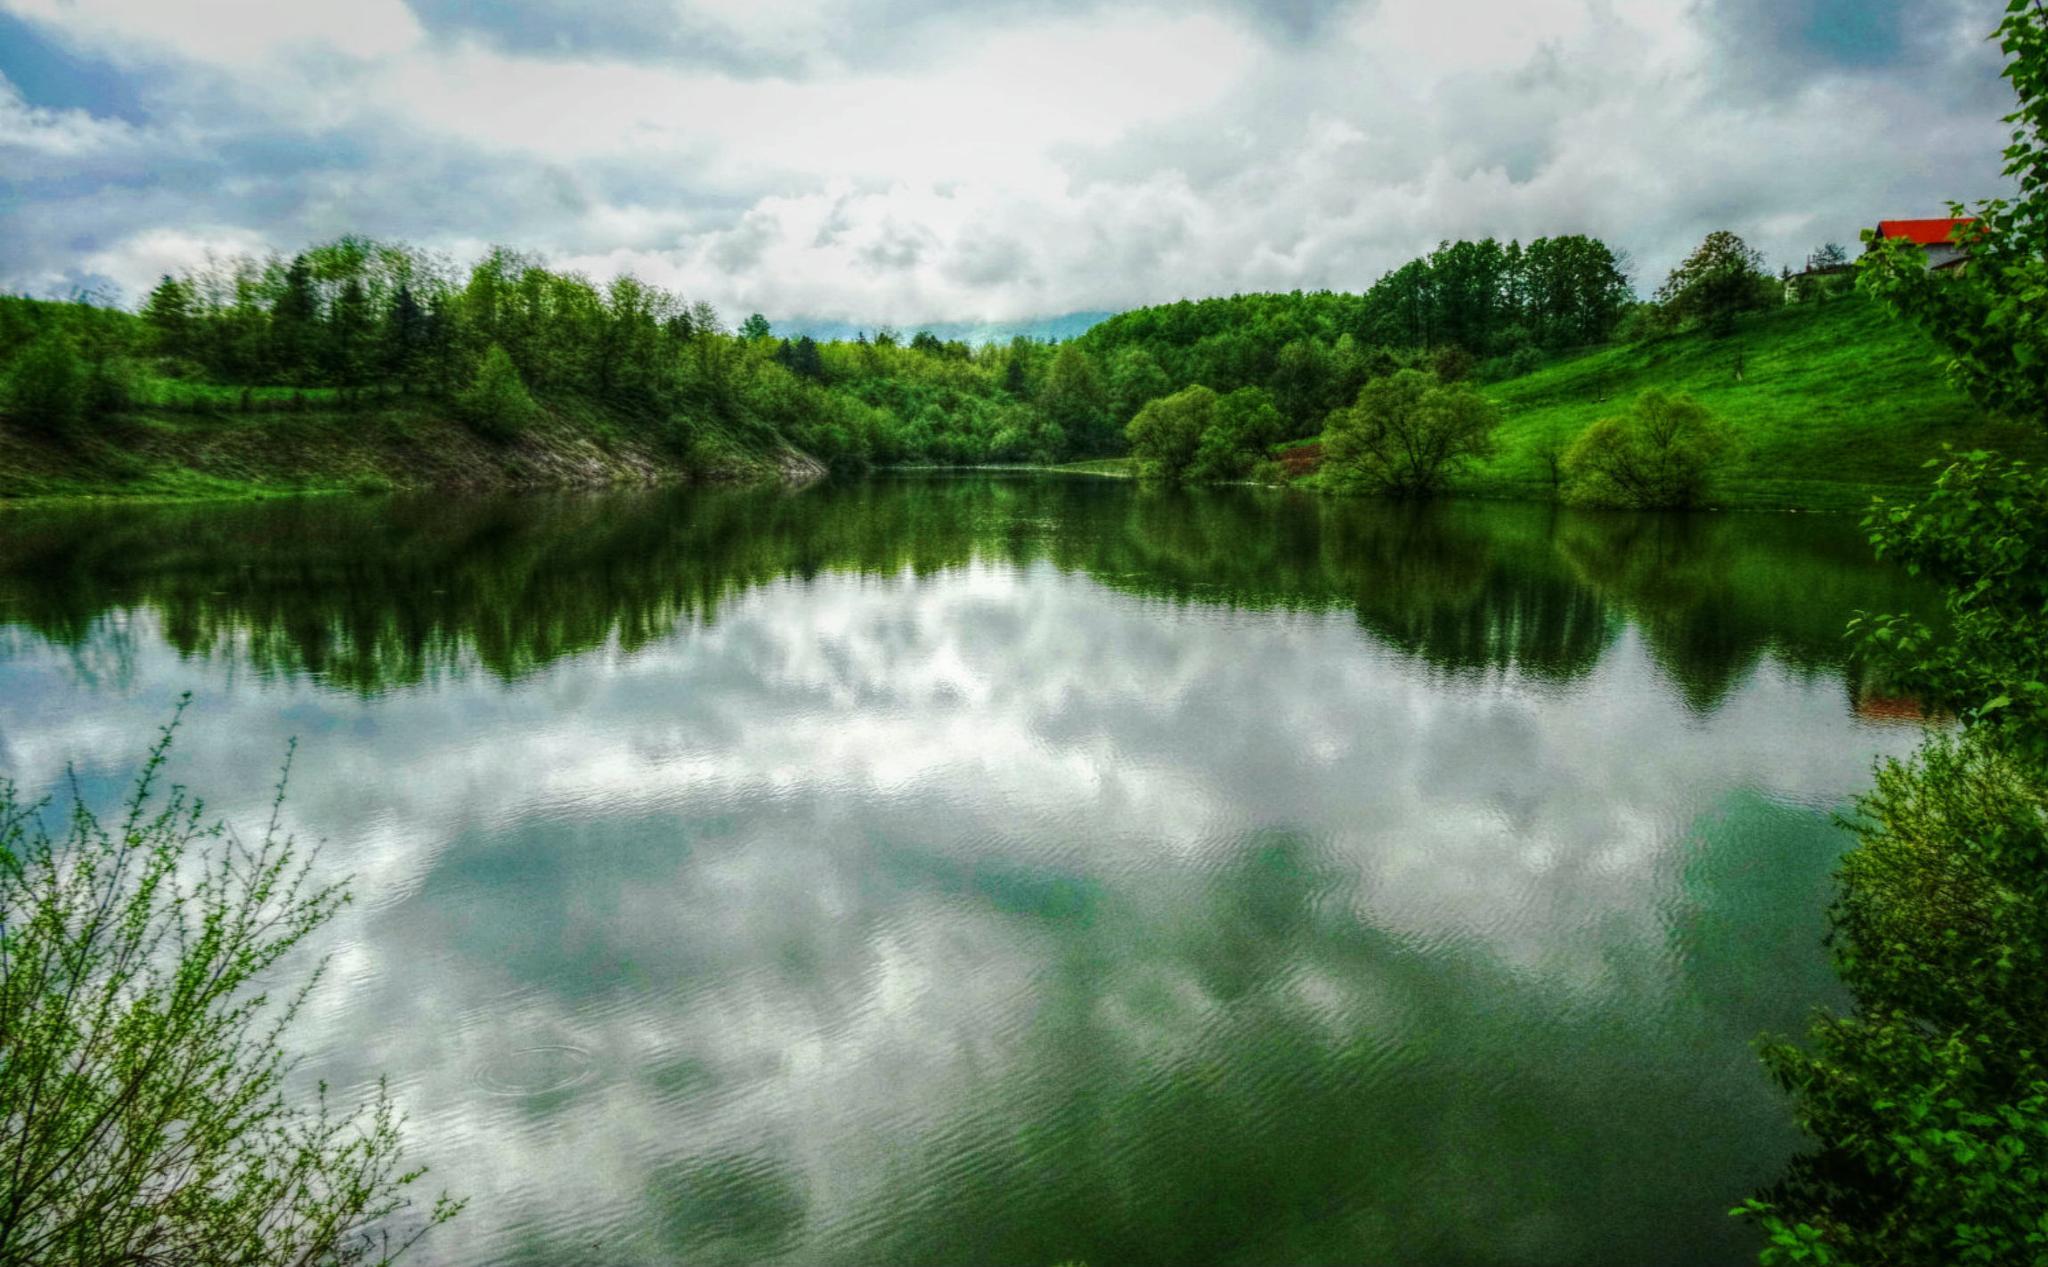 natural mirror  by Mešić Emina